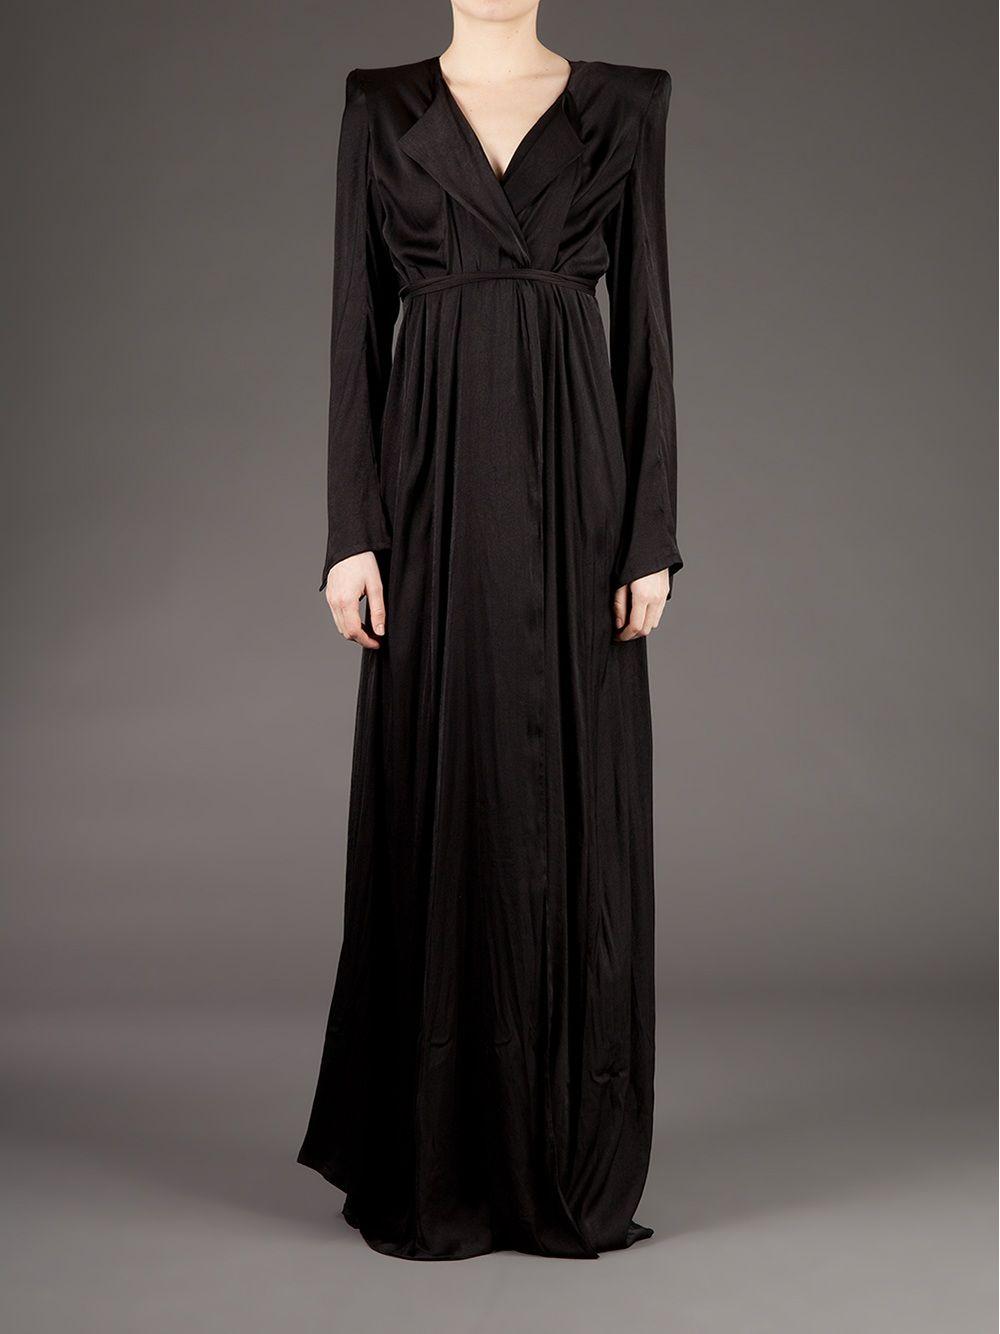 Msgm x diadora cropped zipper jacket maxi dresses vegan fashion